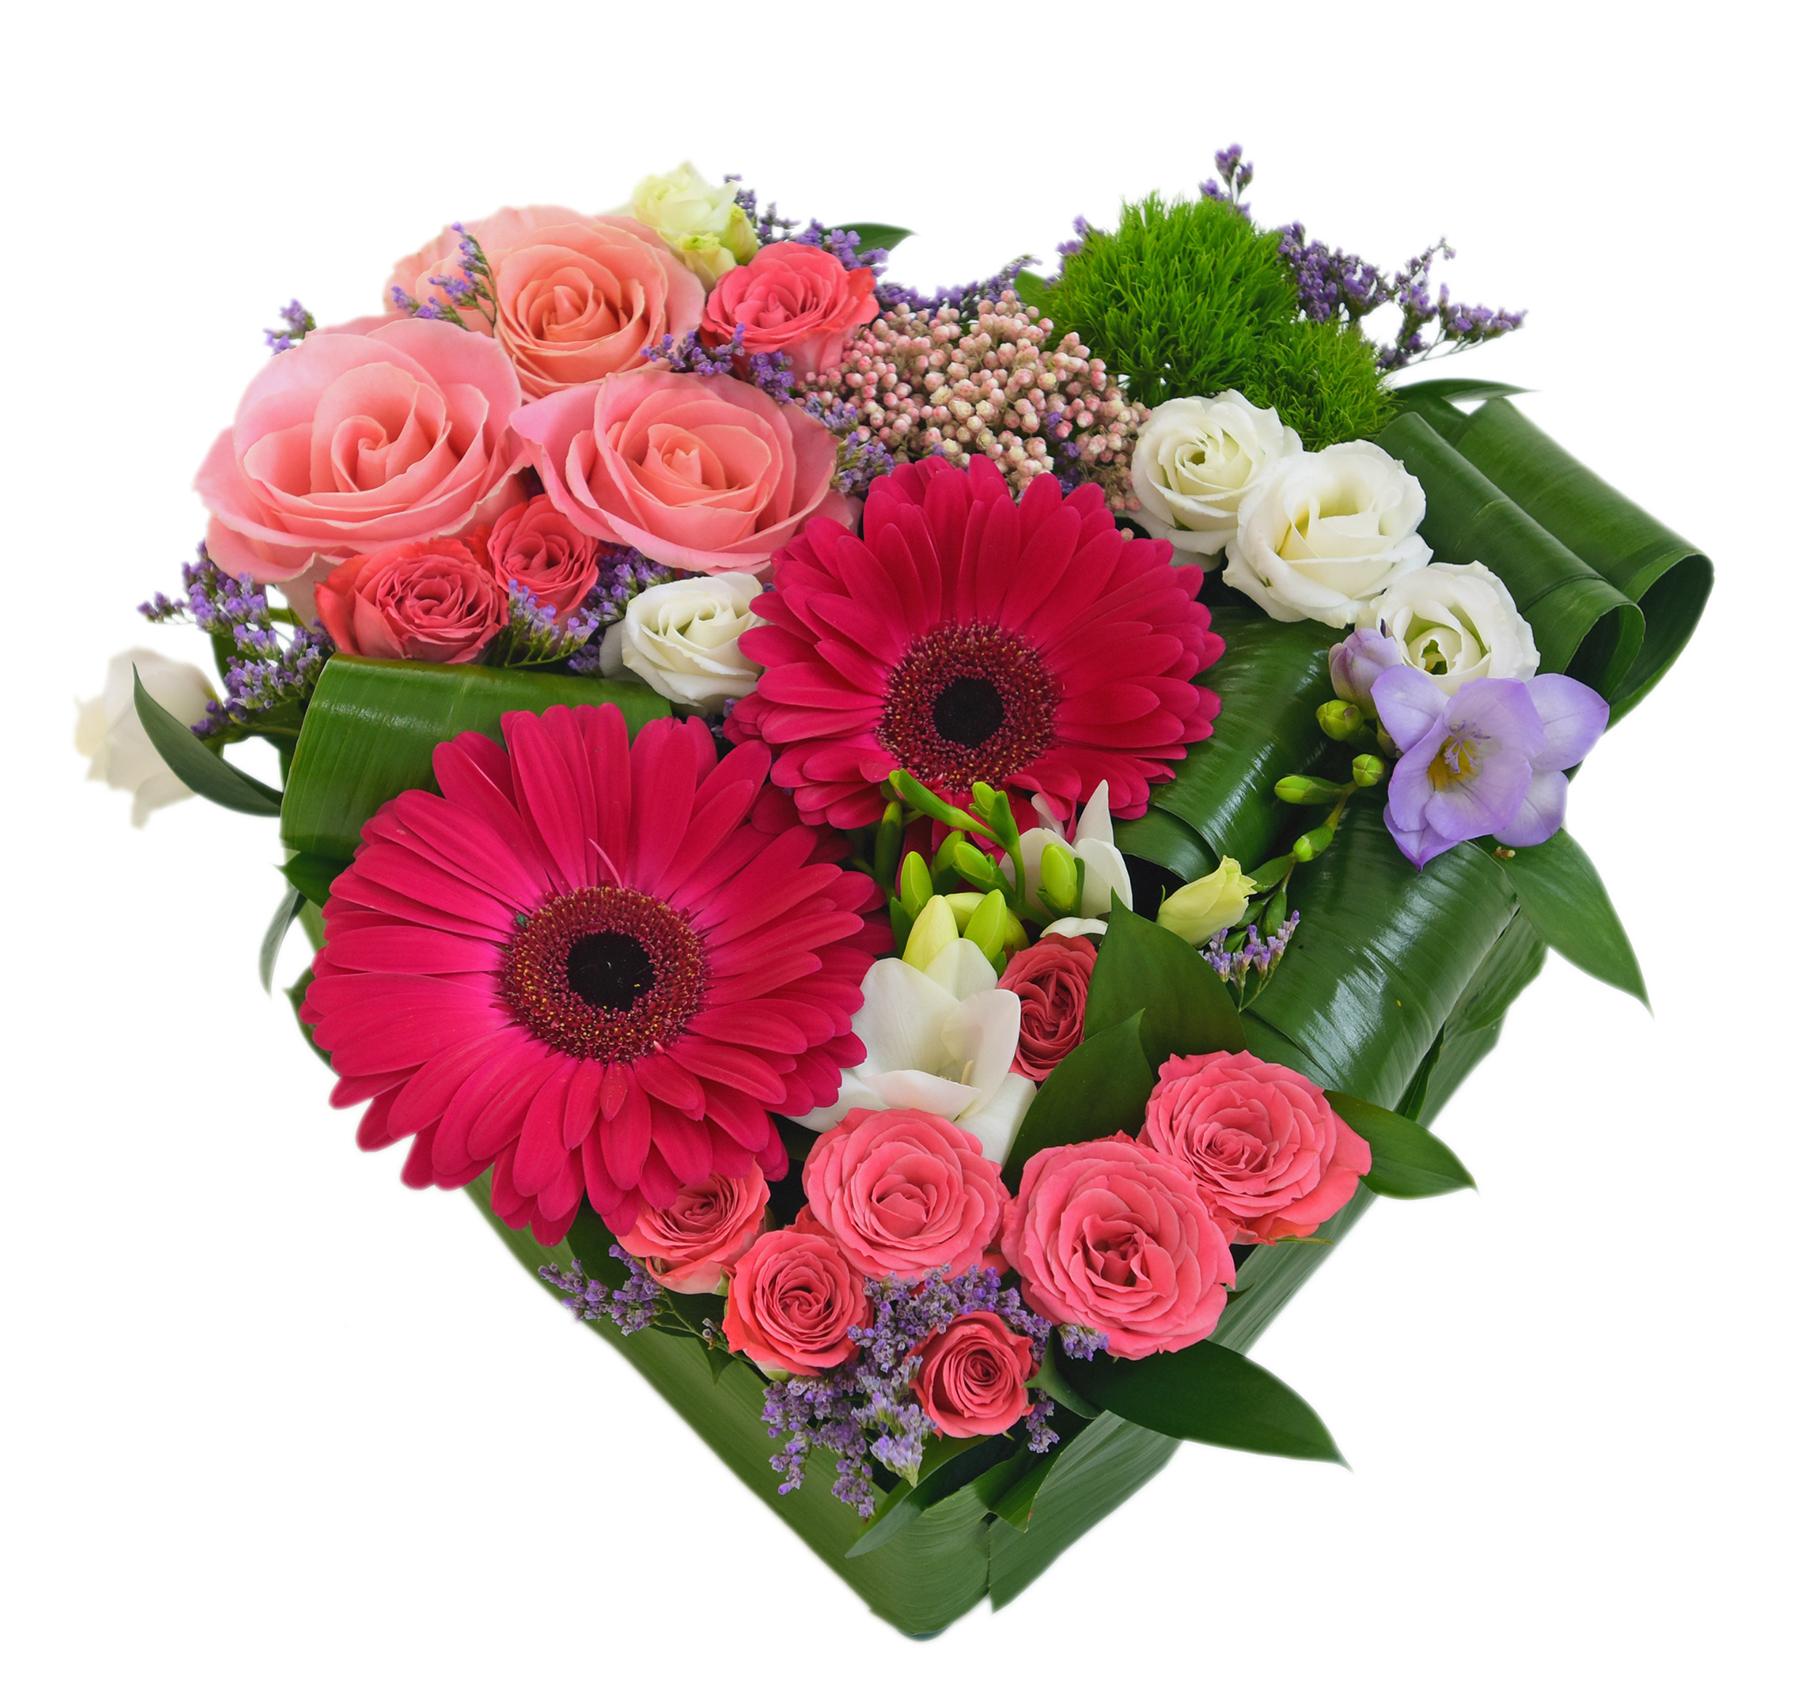 Arata-i ce simti pentru ea: ofera-i un aranjament floral in forma de inima!